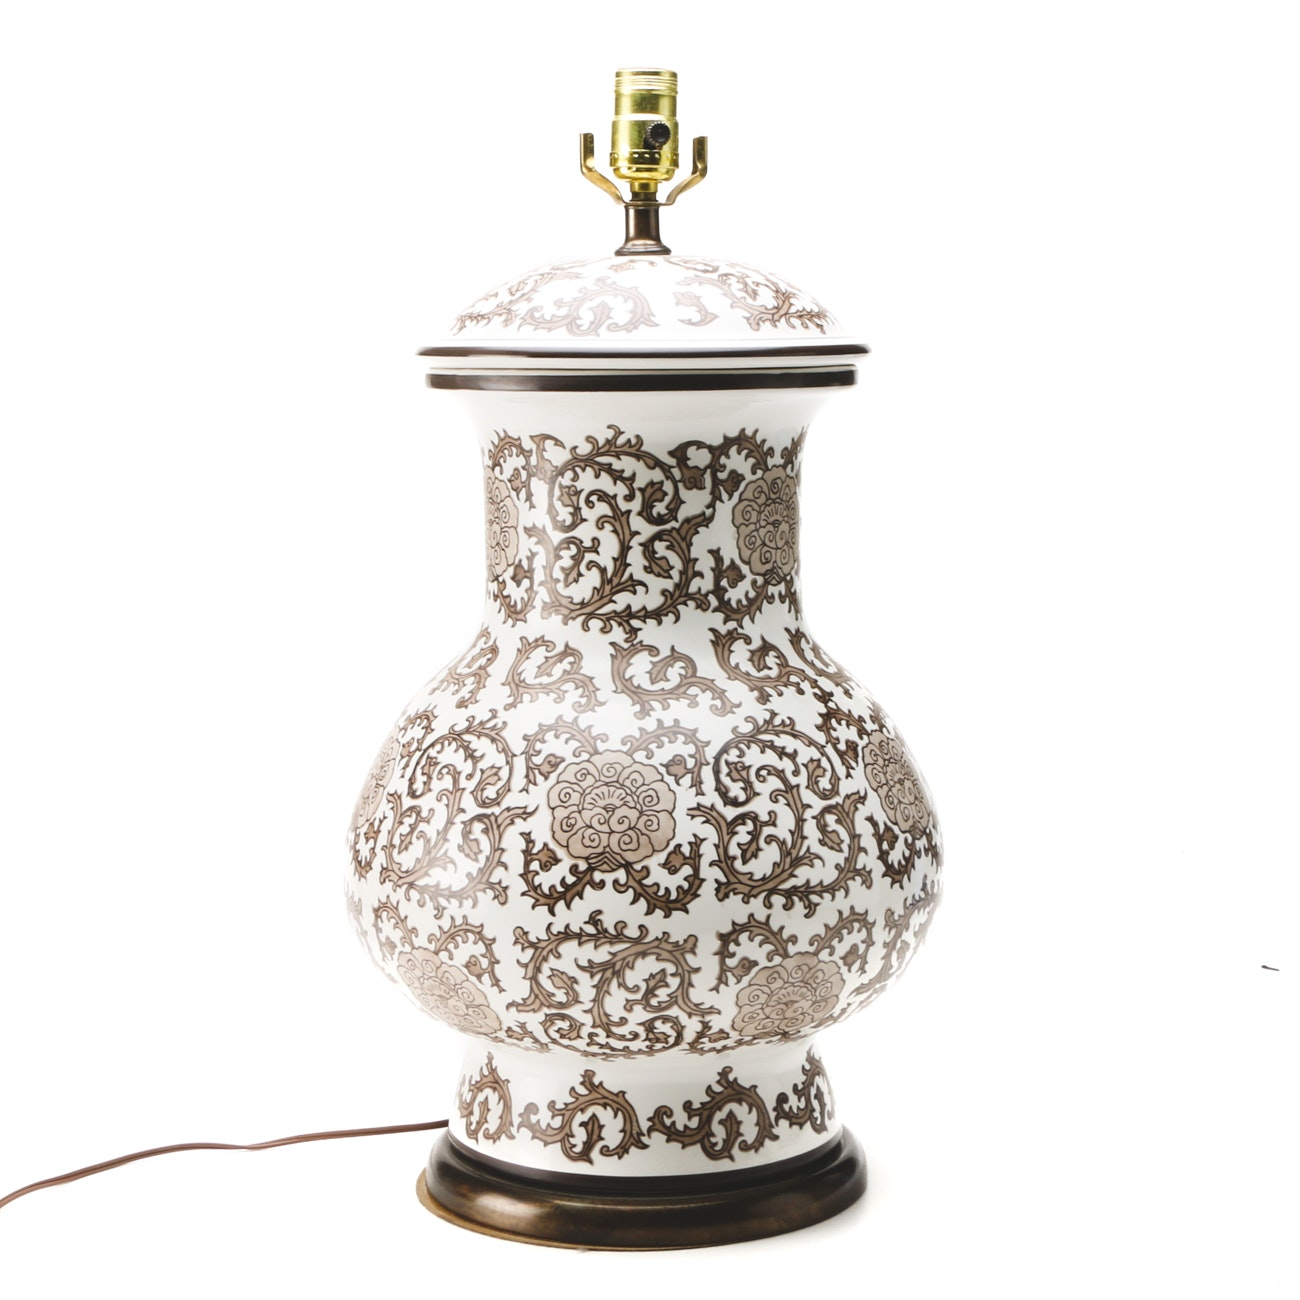 Decorative Chinoiserie Ceramic Lamp